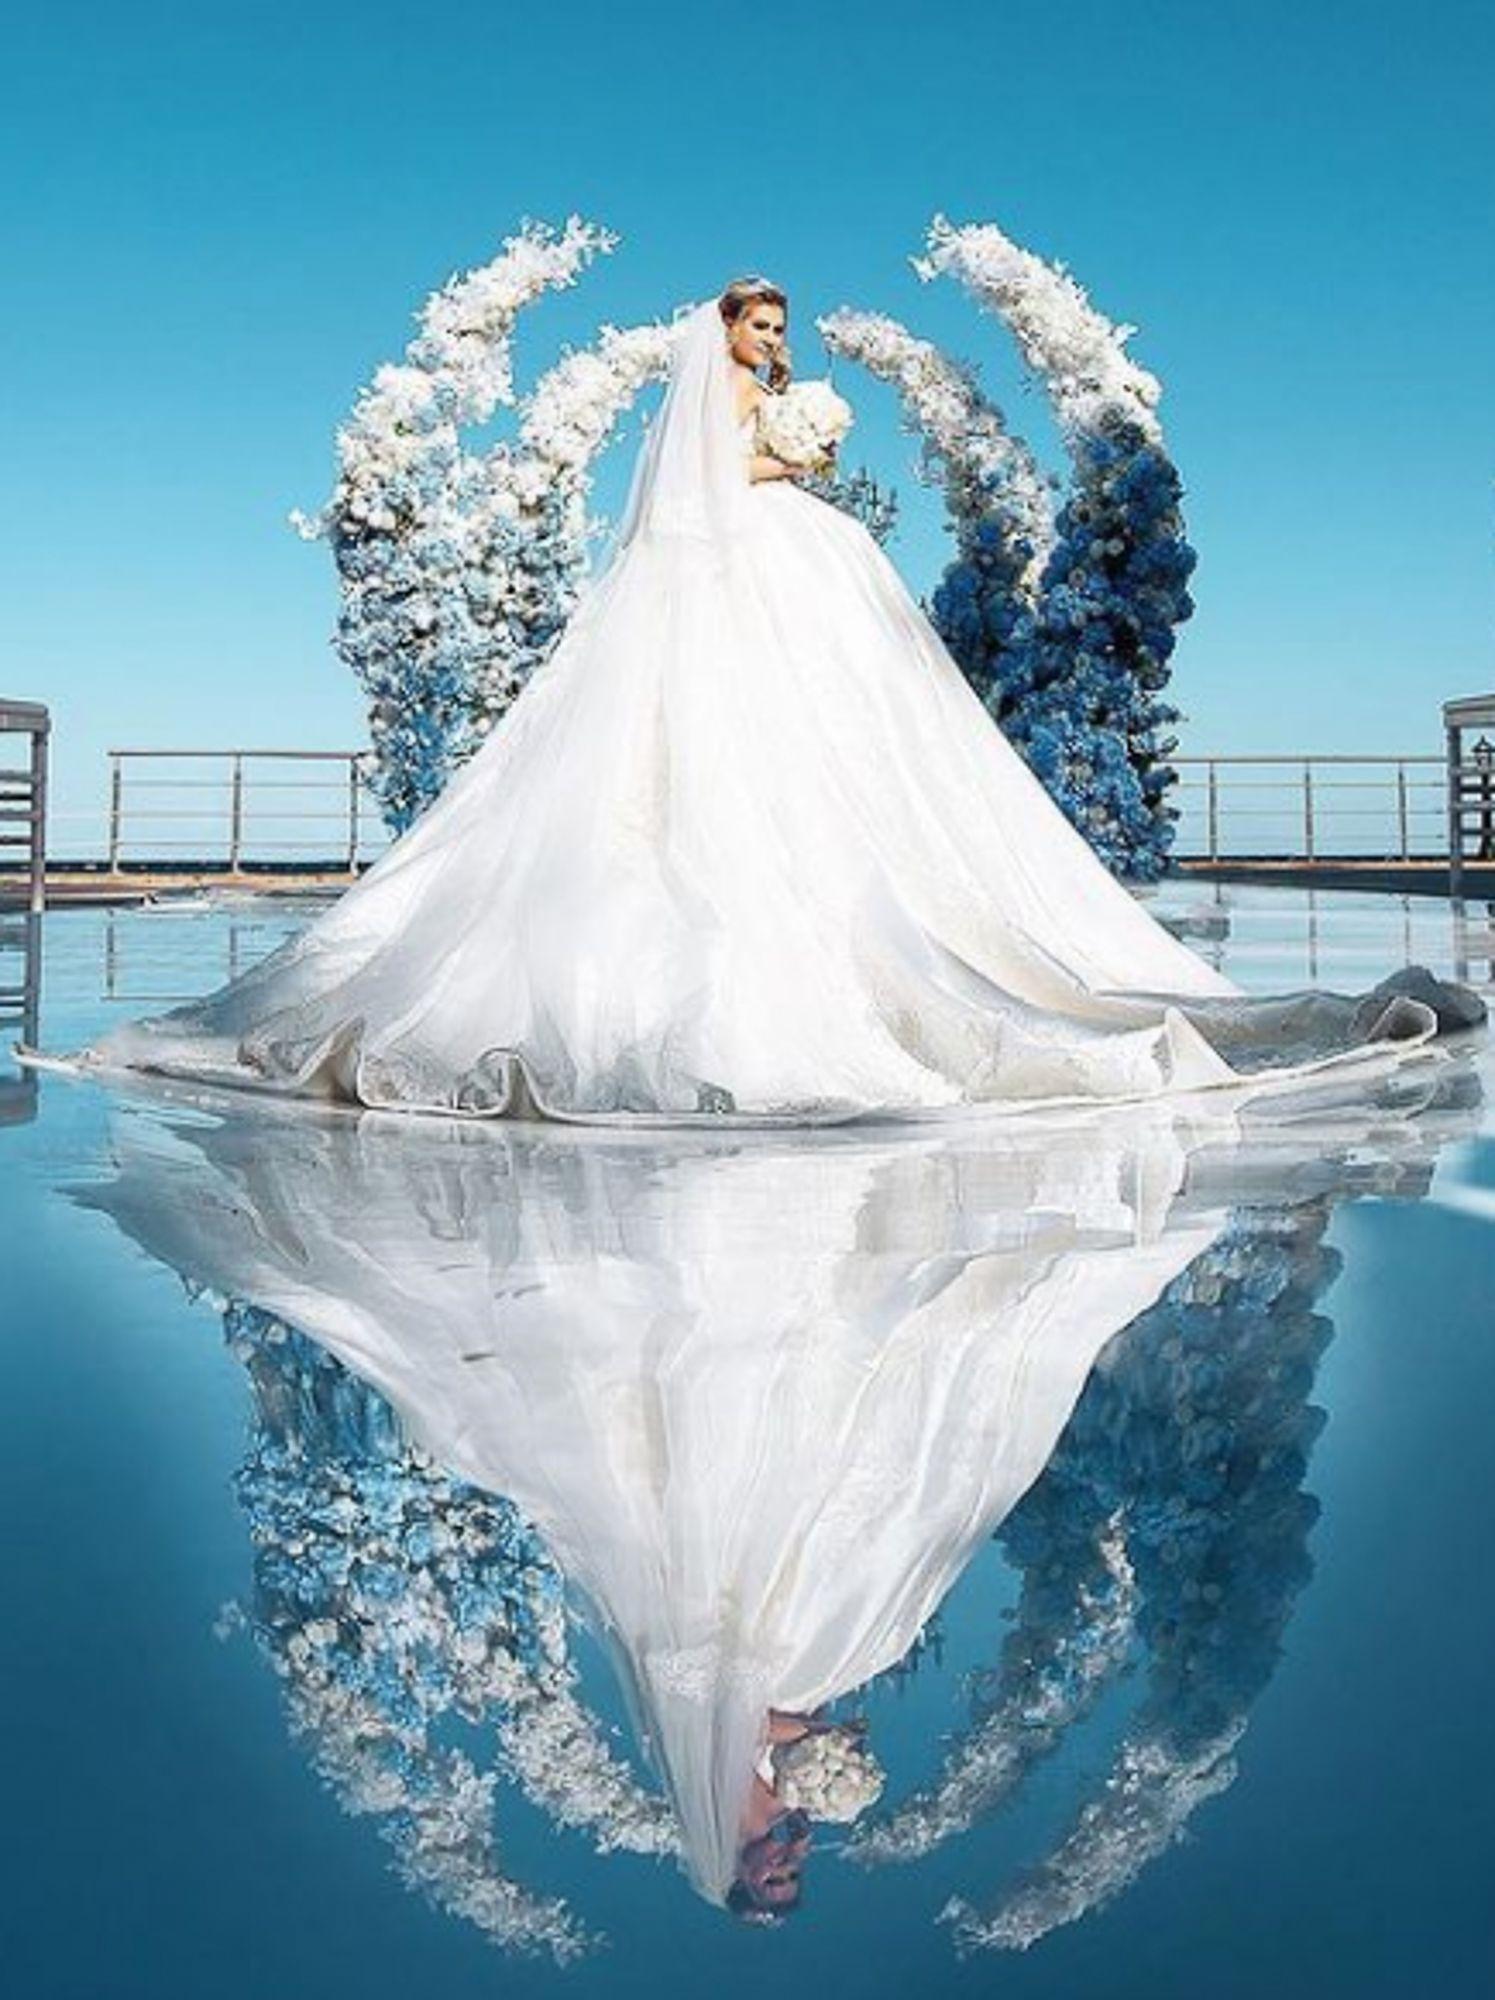 Wedding Planner Bogotá Lo Que Debes Saber Del Organizador De Eventos Planificadores De Bodas Bodas Sencillas Decoracion Matrimonio